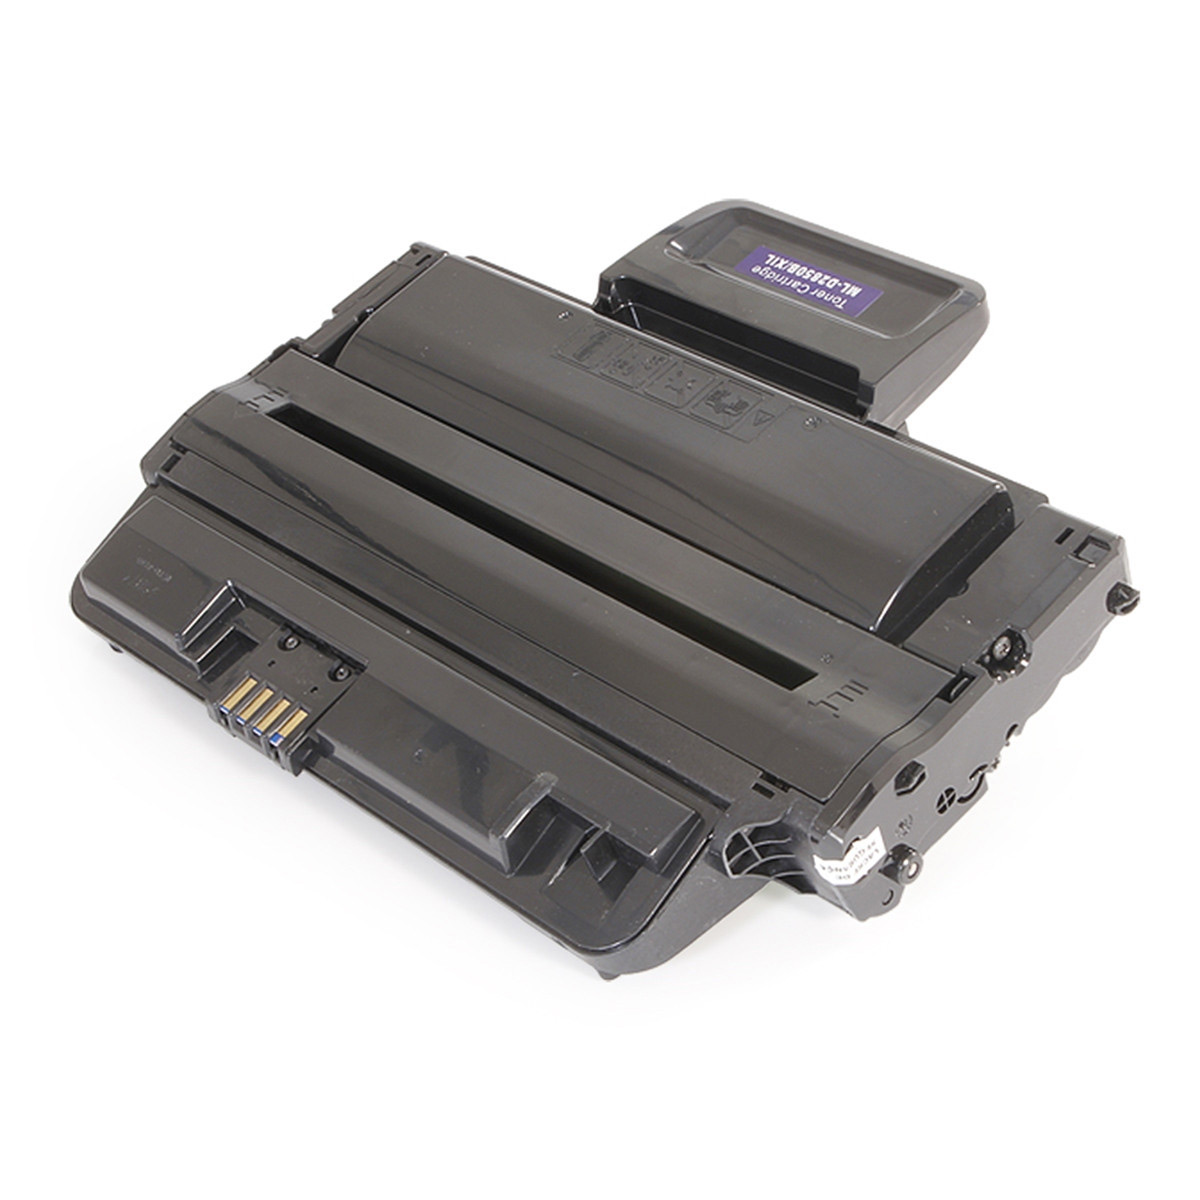 Cartucho de Toner Compatível Xerox 106R01374 Preto